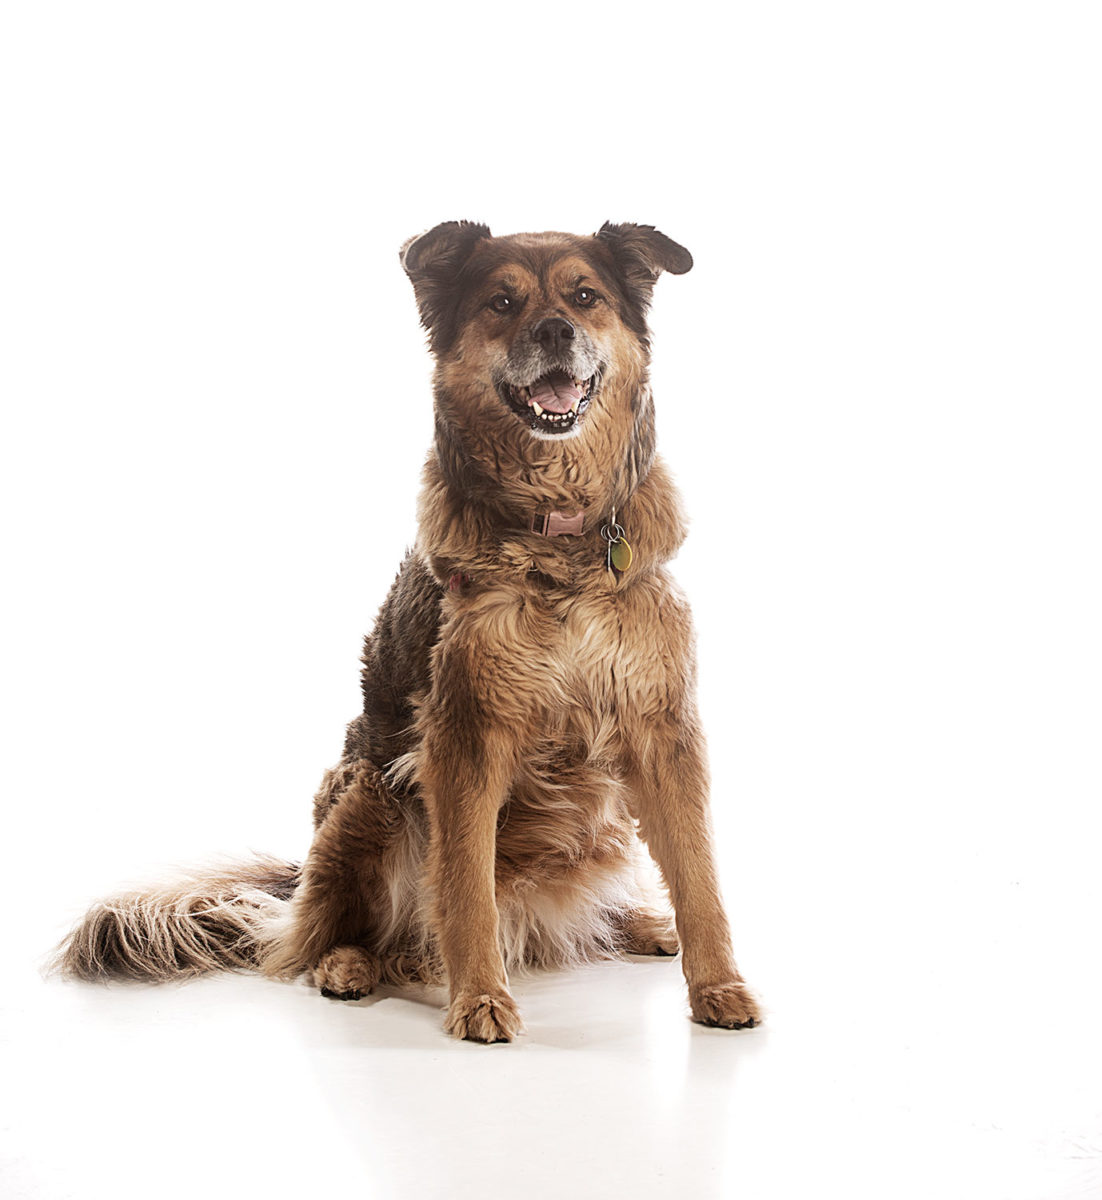 Studio photograph of a brown adult dog.